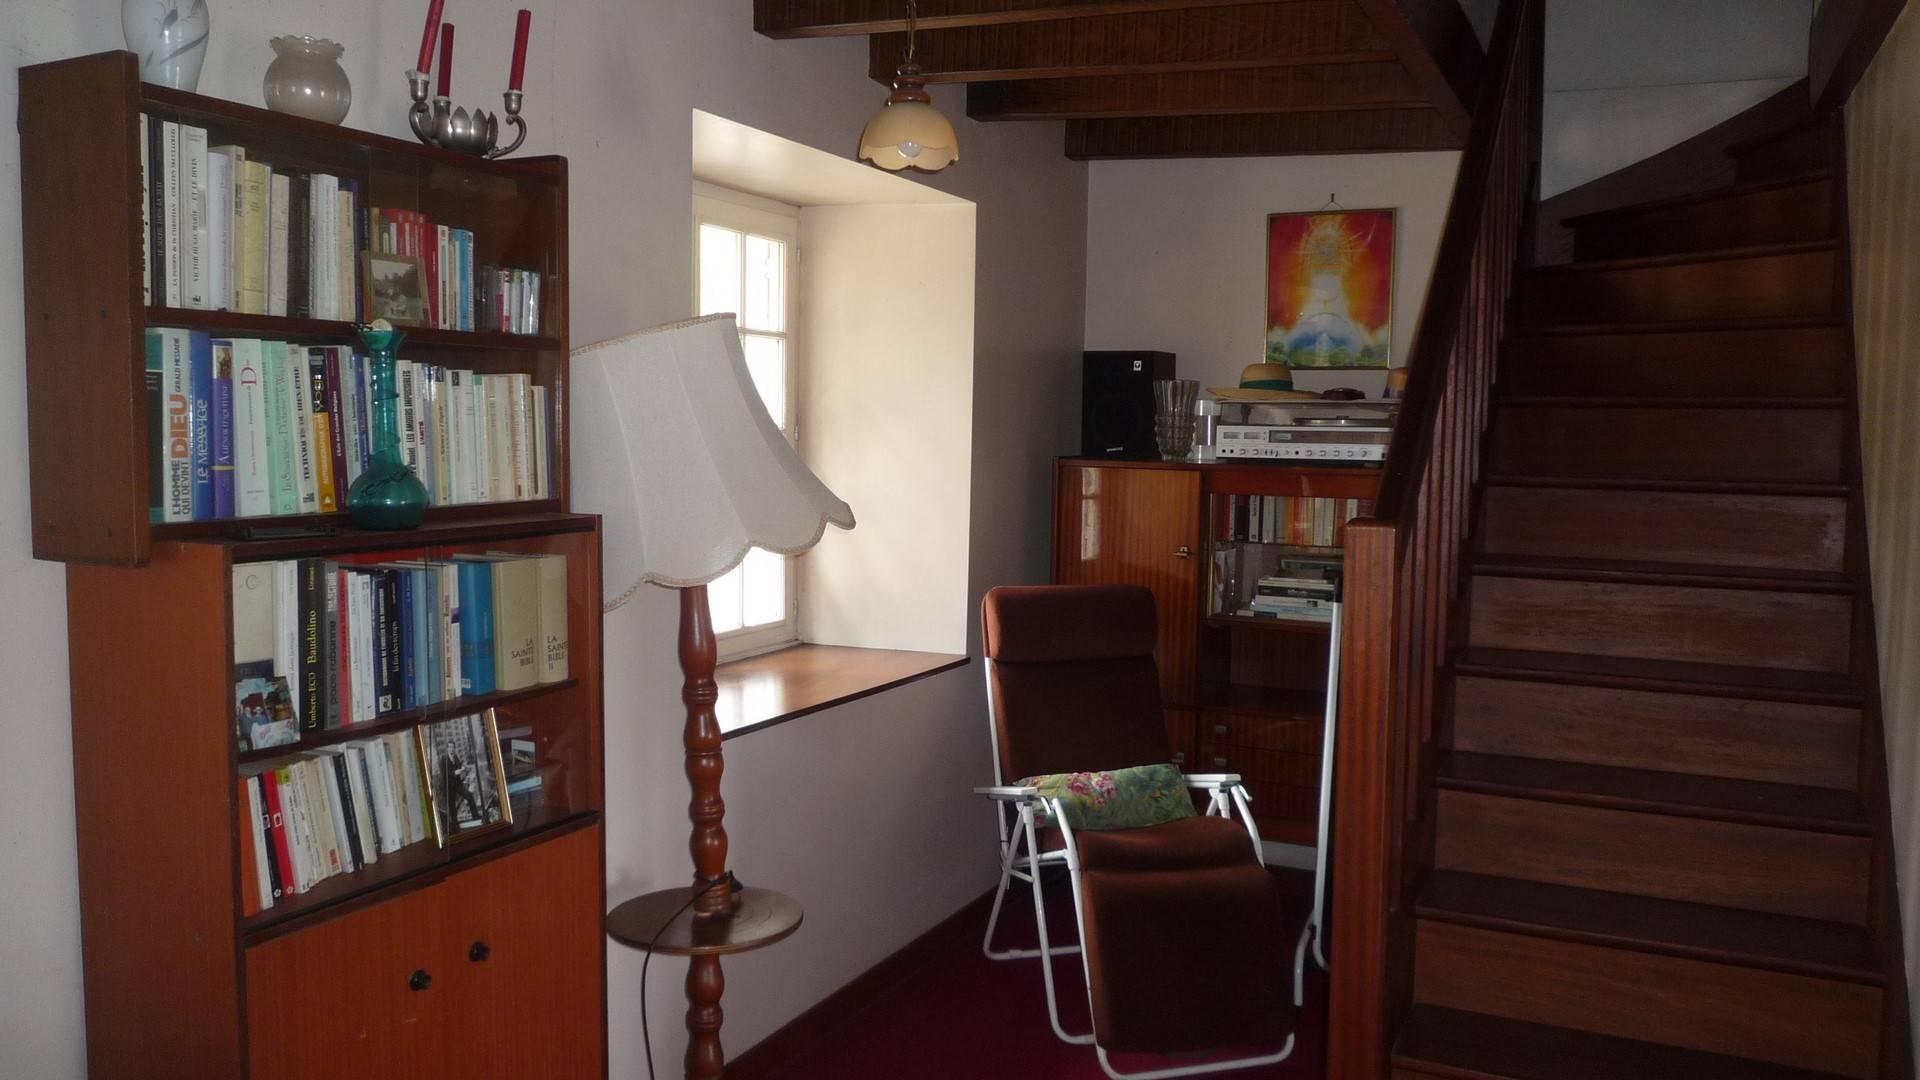 maison lanouee josselin viager occup lanou e. Black Bedroom Furniture Sets. Home Design Ideas